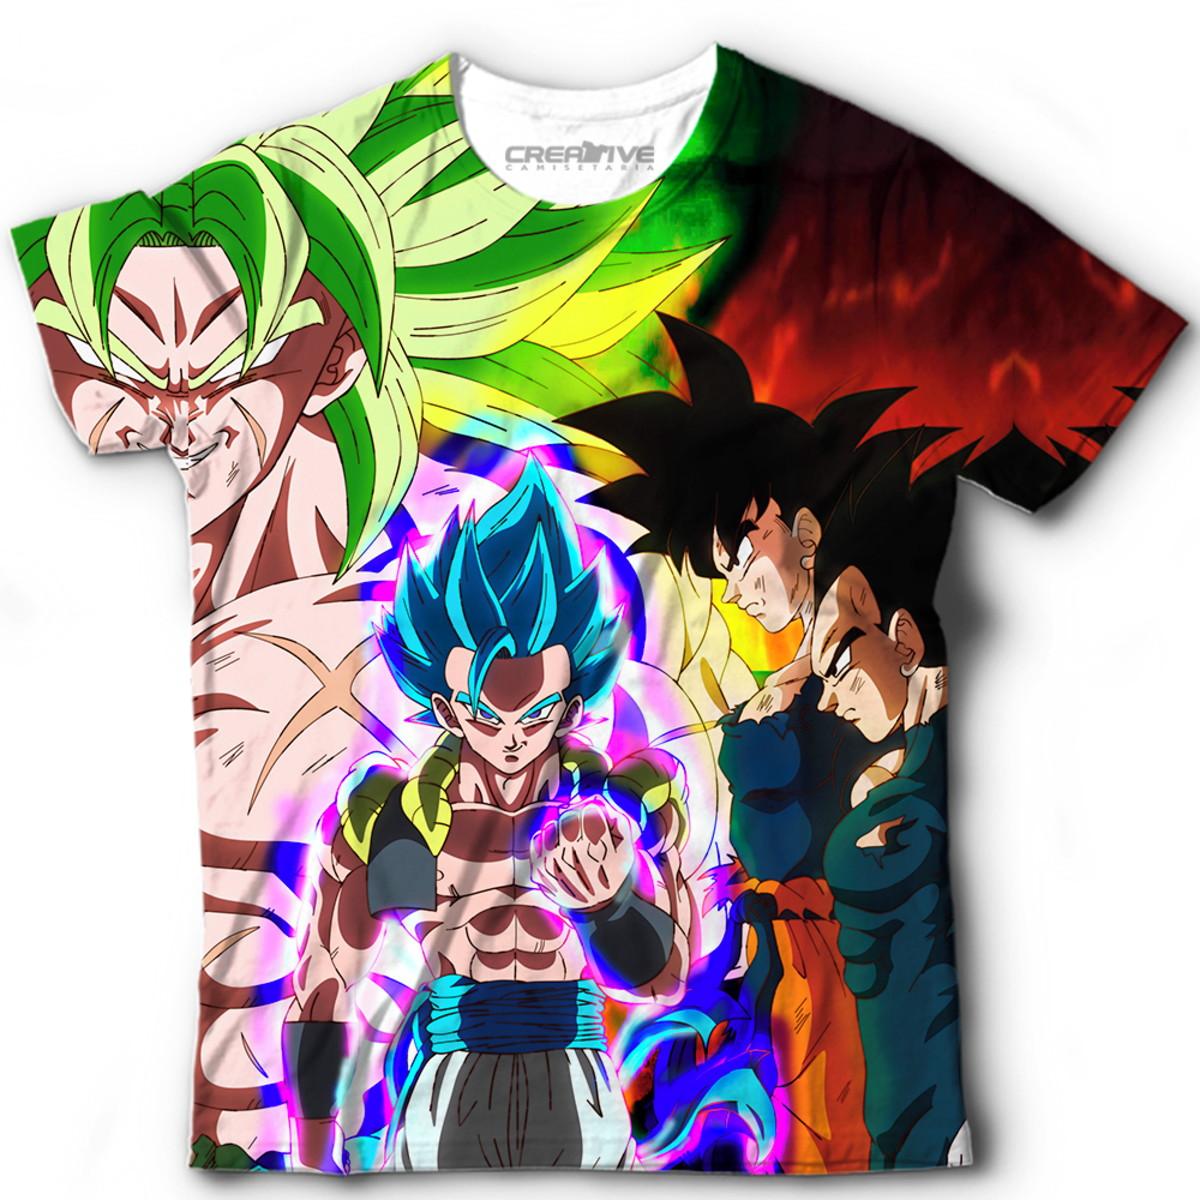 74859b7f98 Camiseta Blusa Dragon Ball Super Vegetto Gogeta SSJ no Elo7 ...